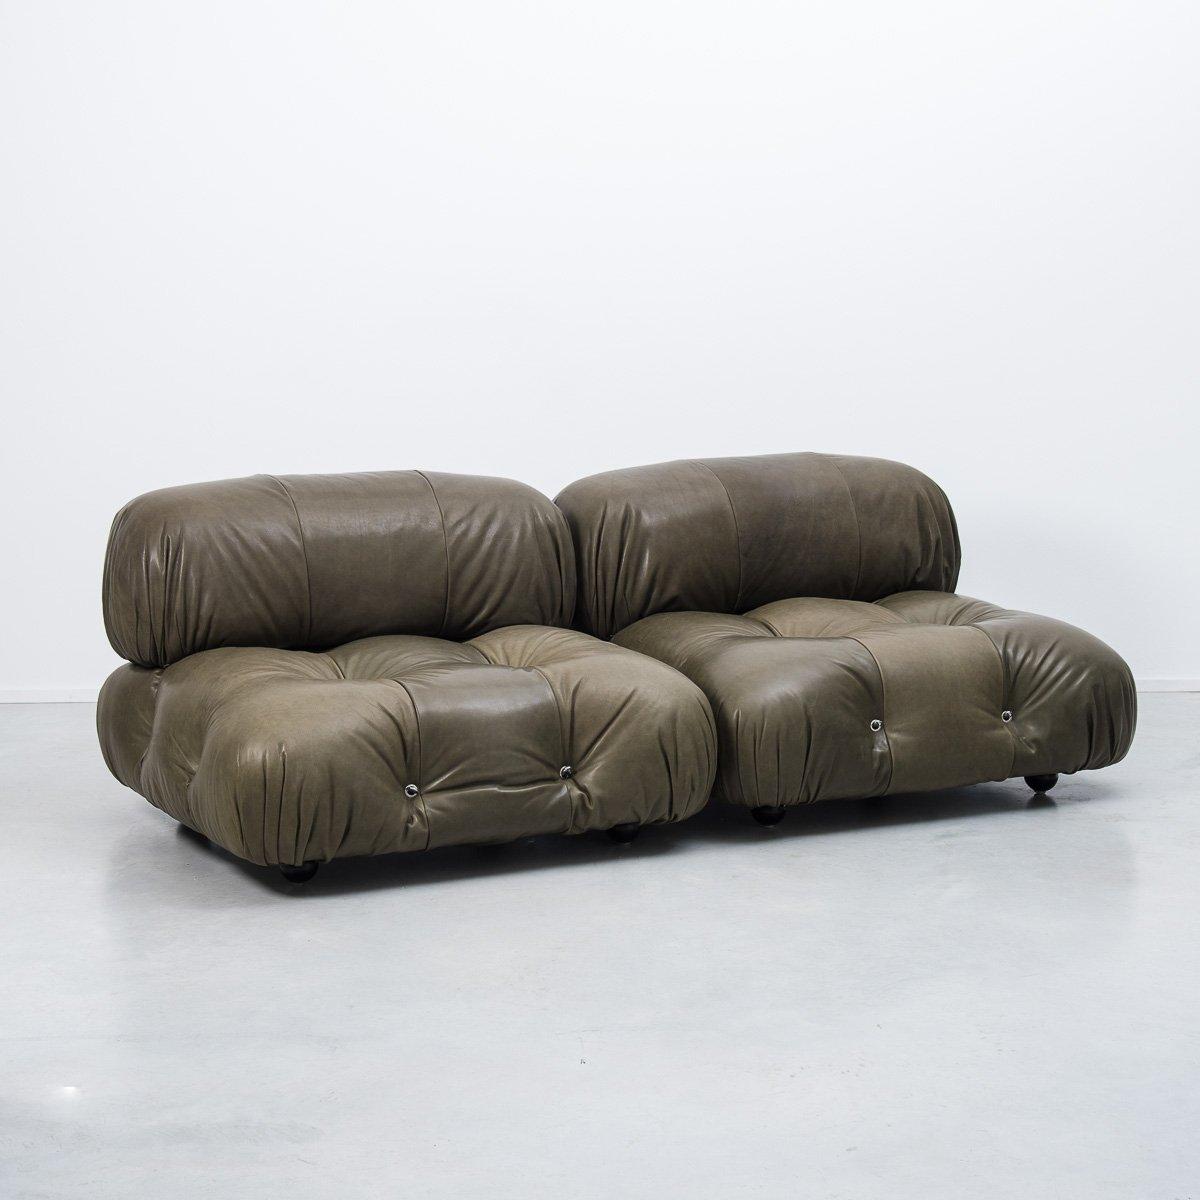 camaleonda modular sofa by mario bellini for b b italia 1971 for sale at pamono. Black Bedroom Furniture Sets. Home Design Ideas